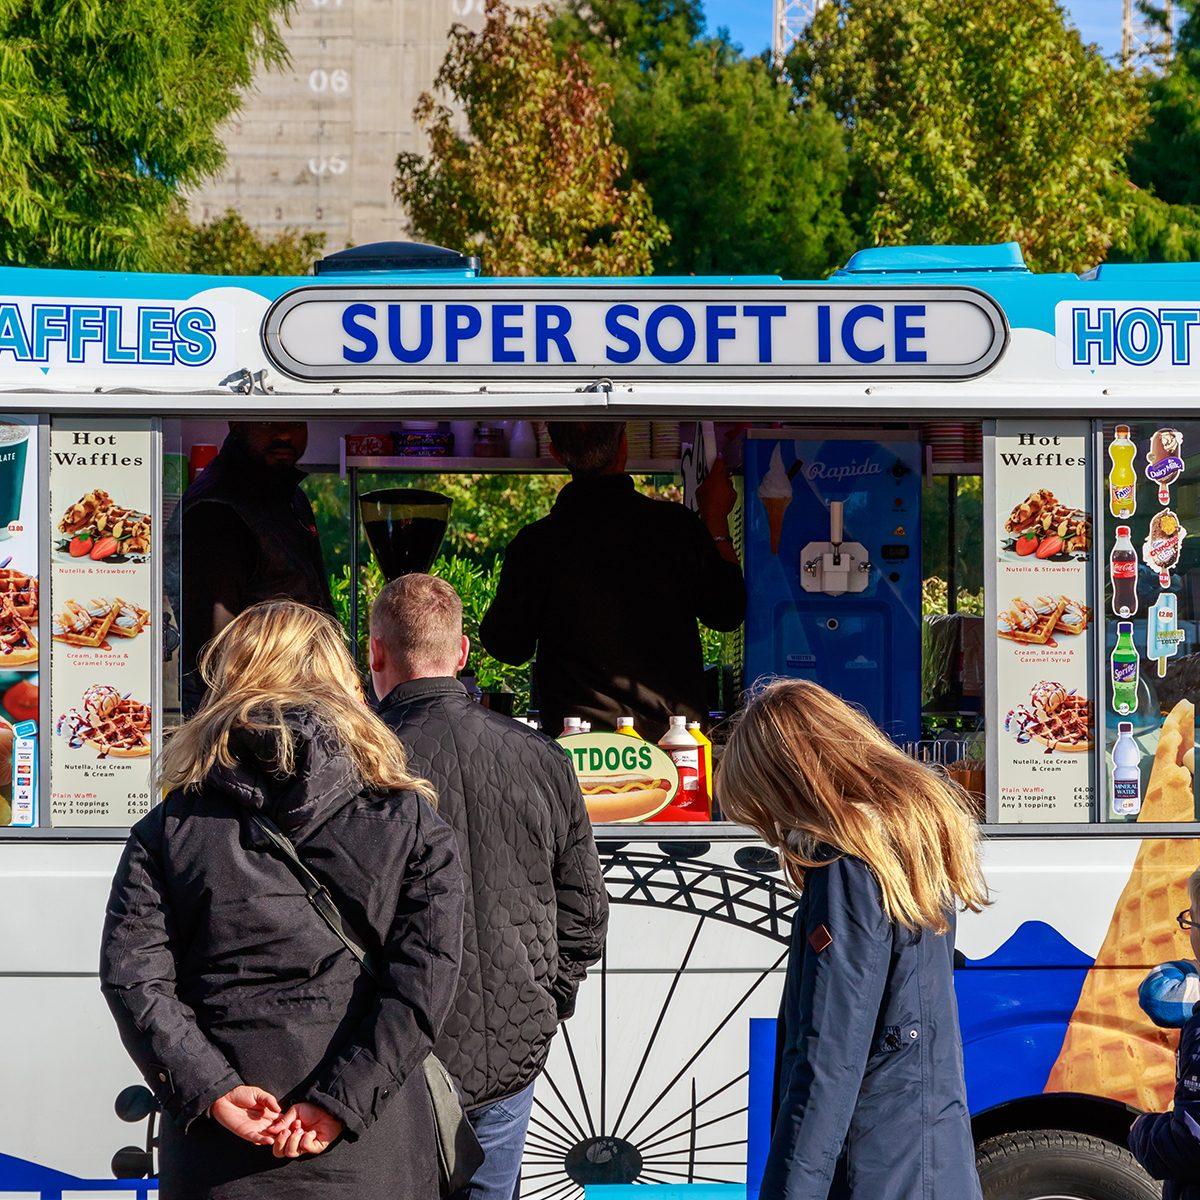 Ice cream van and customers on London street